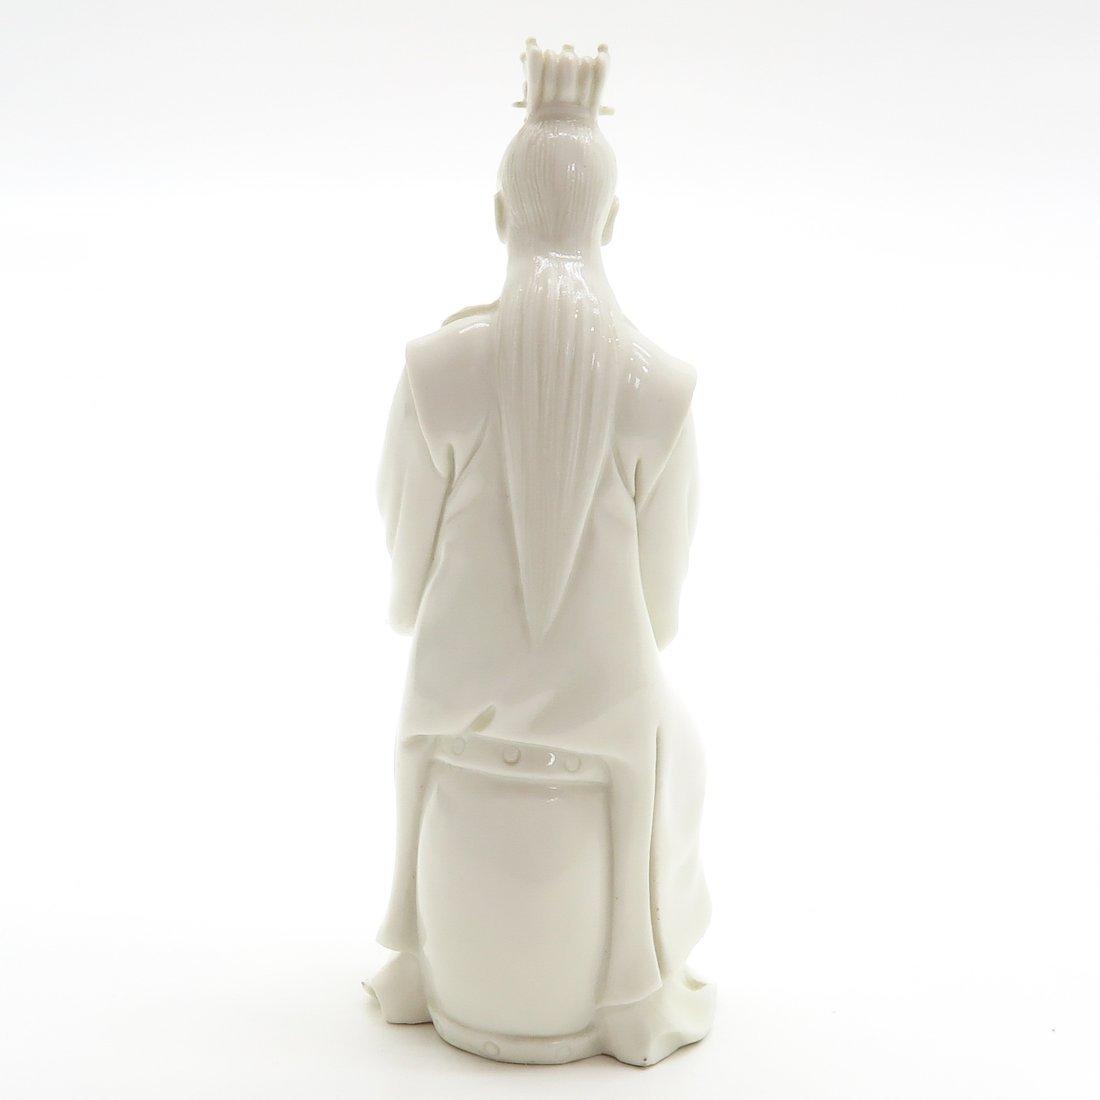 Blanc de China Sculpture - 3